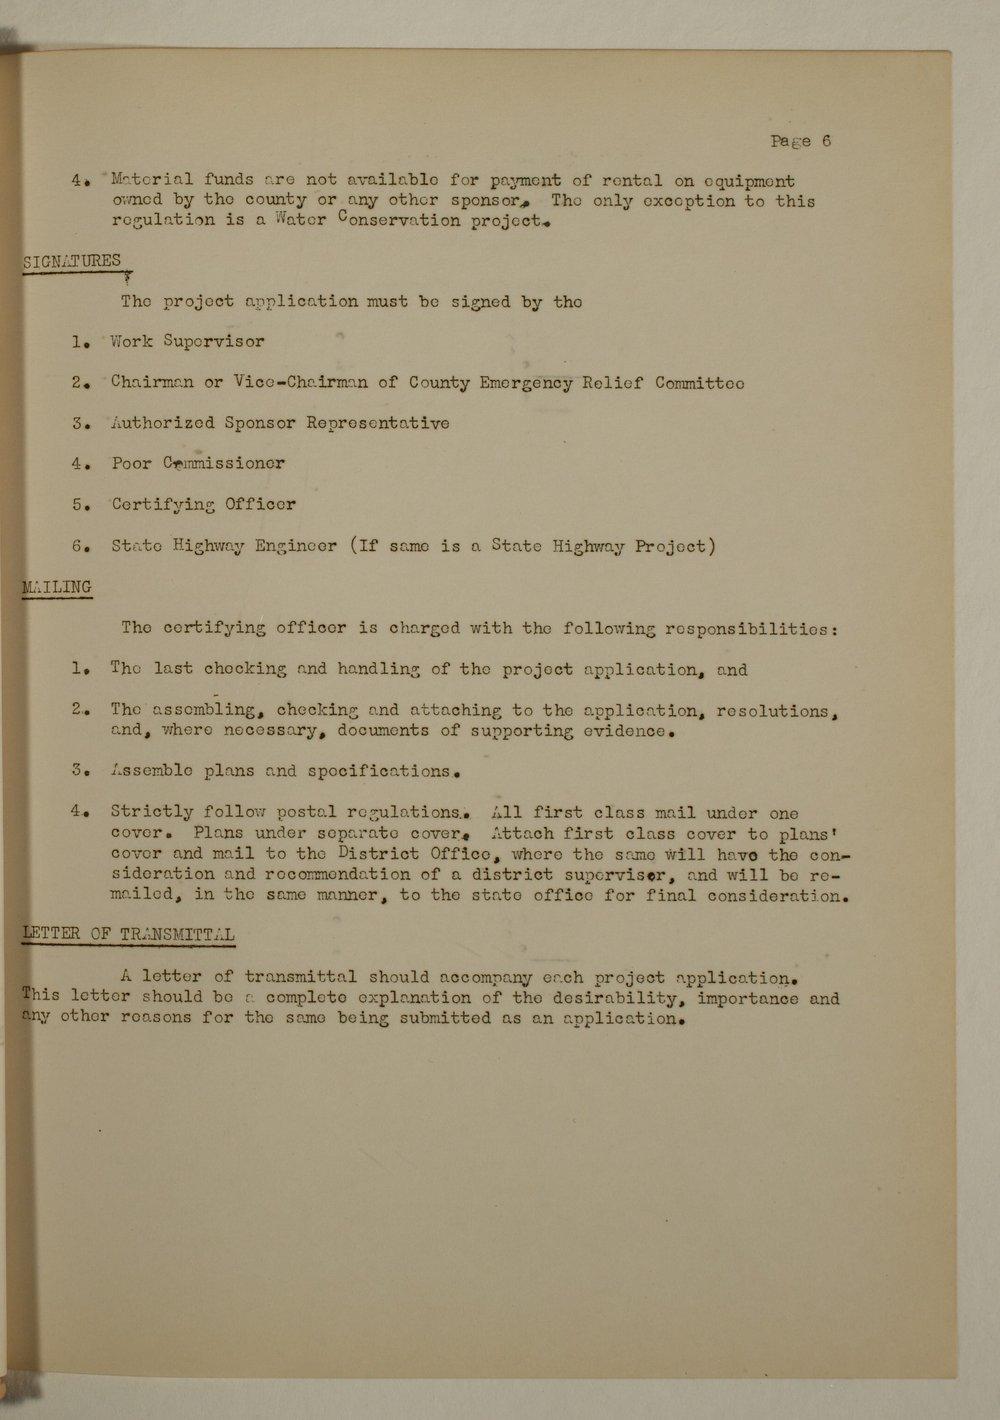 Manual of procedure, engineering department - 6